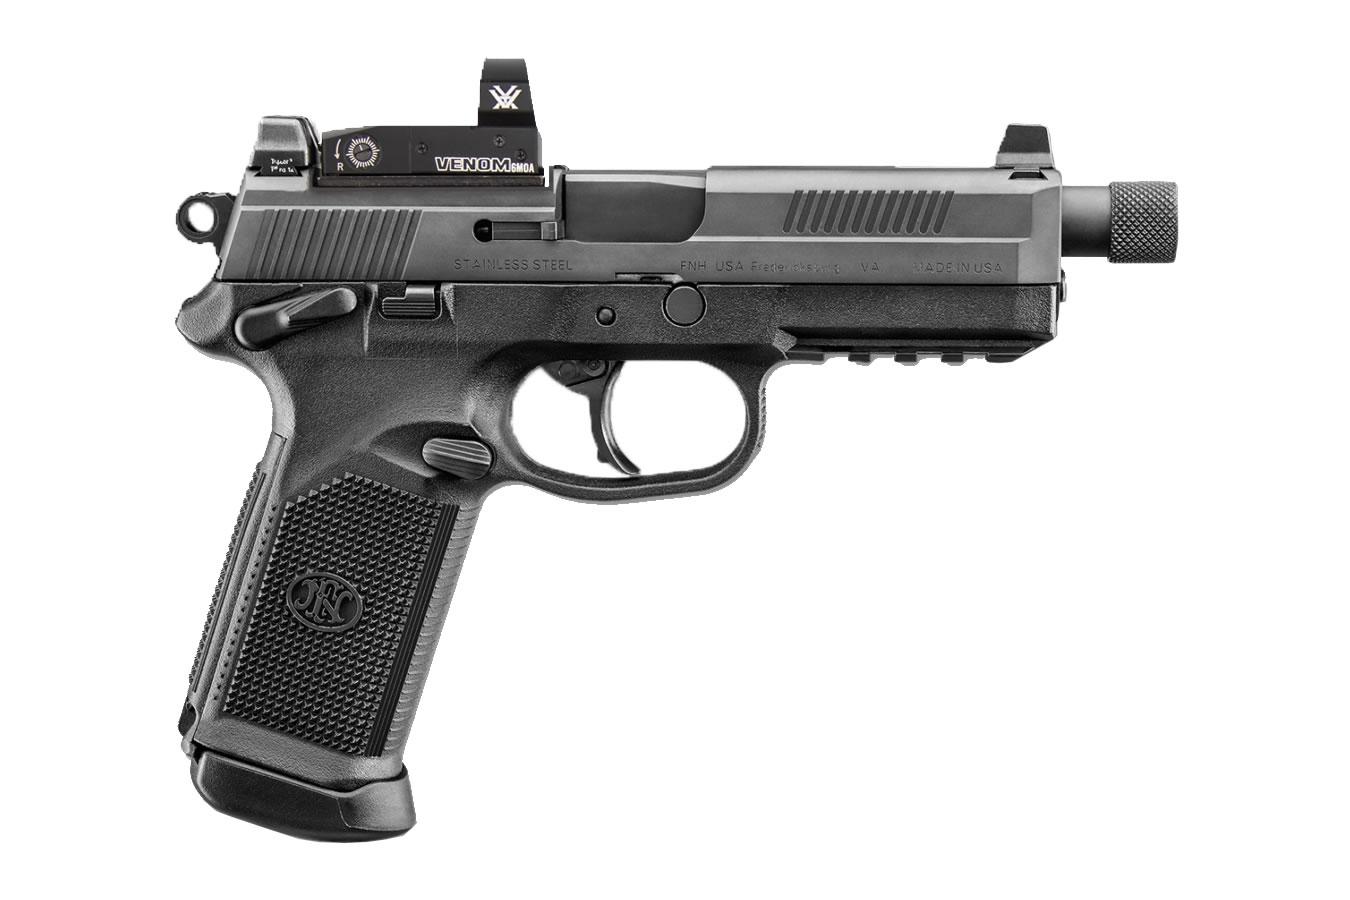 FN FNX-45 Tactical 45 ACP